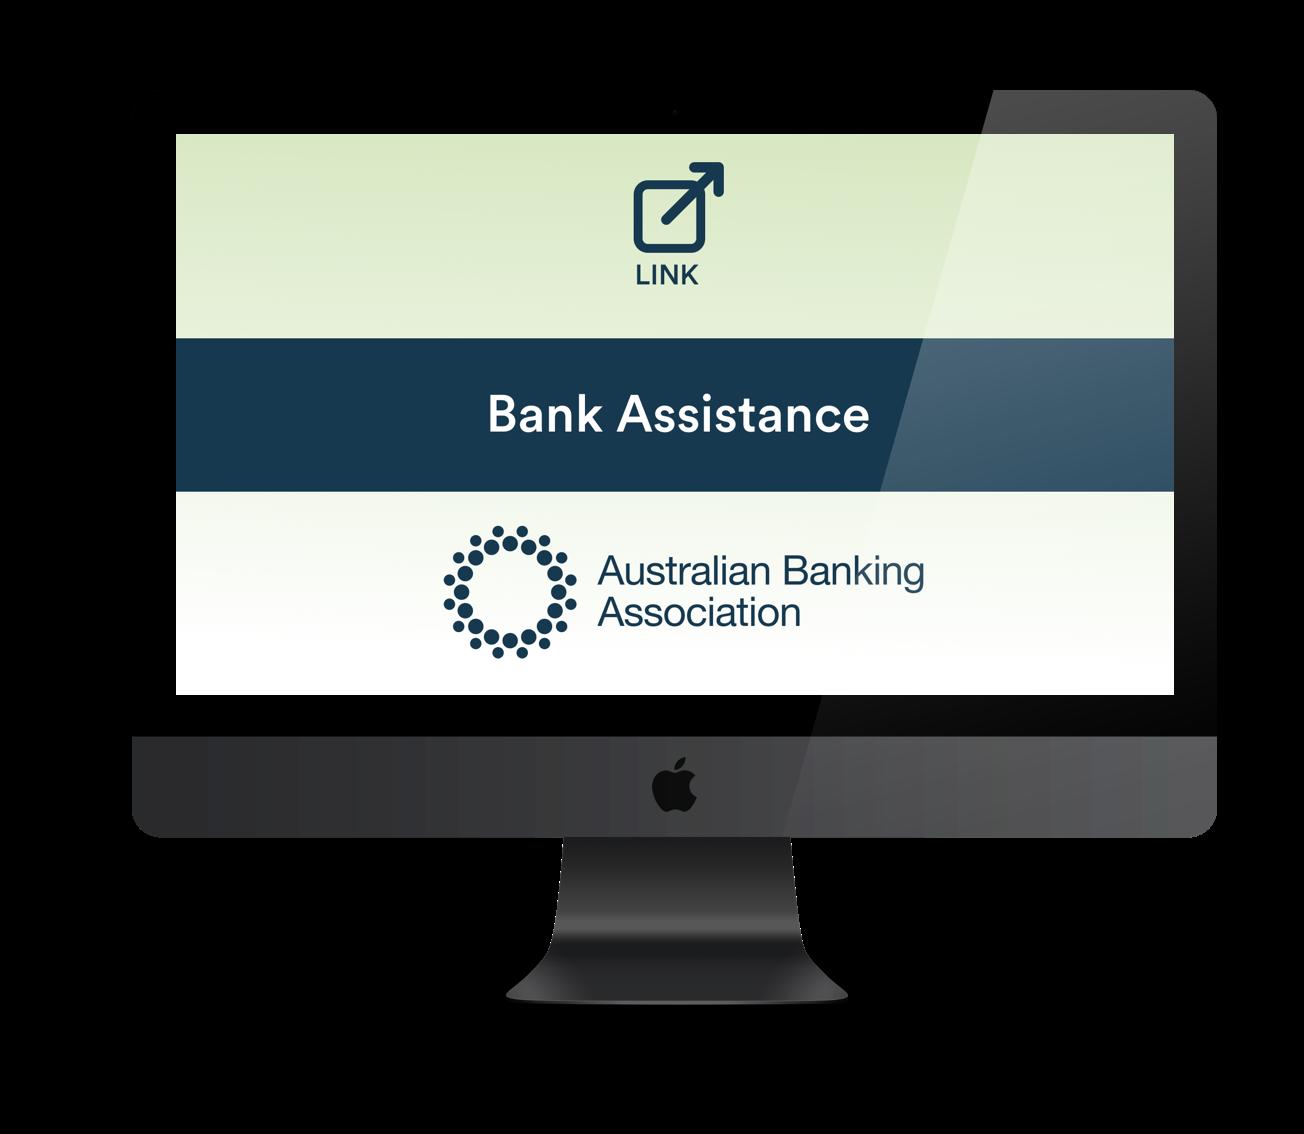 Bank Assistance